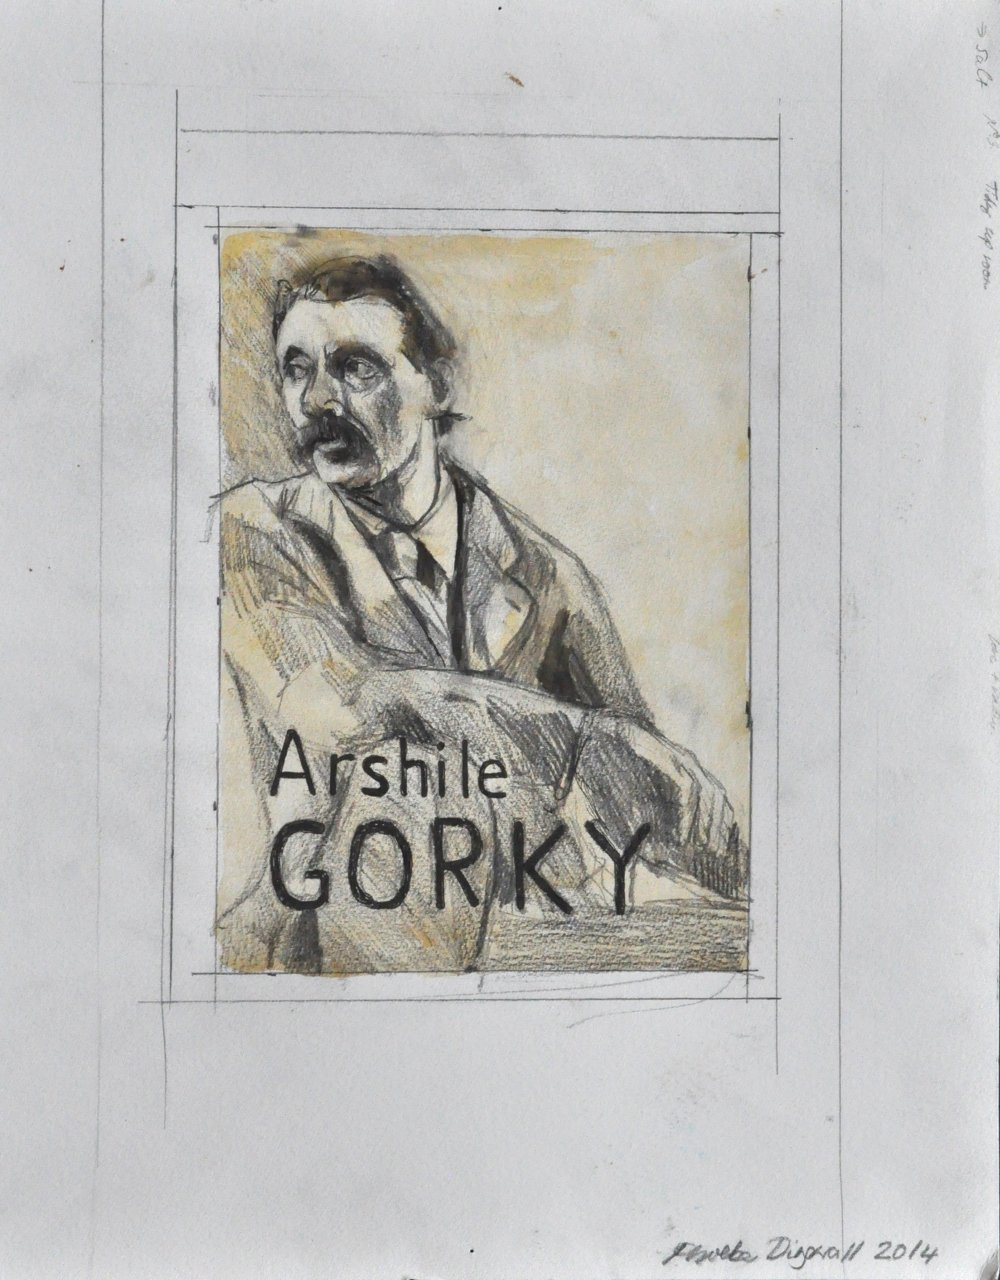 Phoebe Dingwall painting Gorky